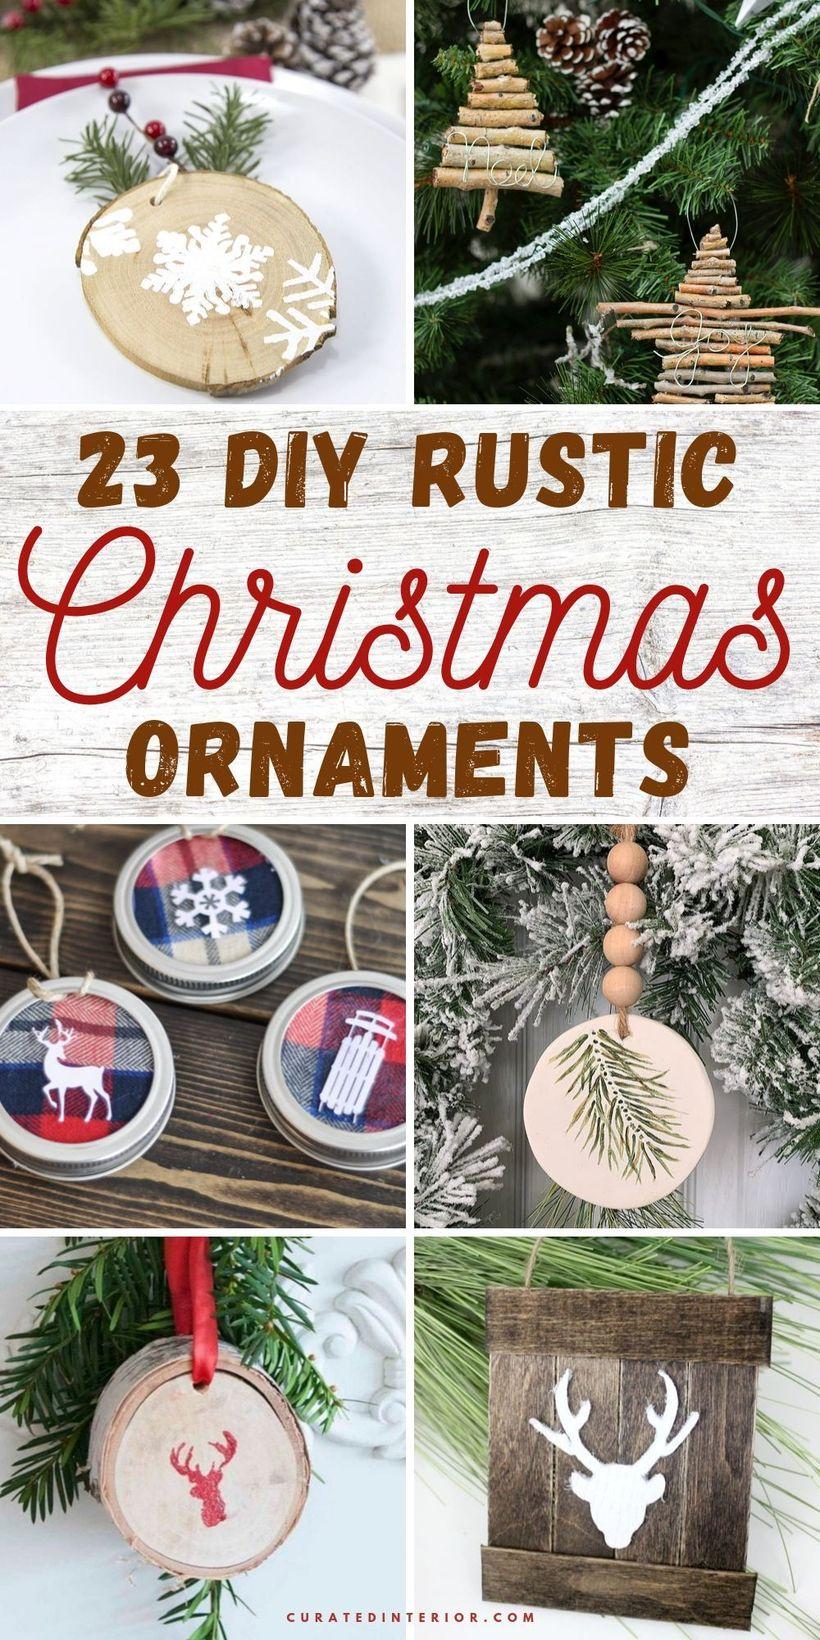 23 DIY Rustic Christmas Ornaments